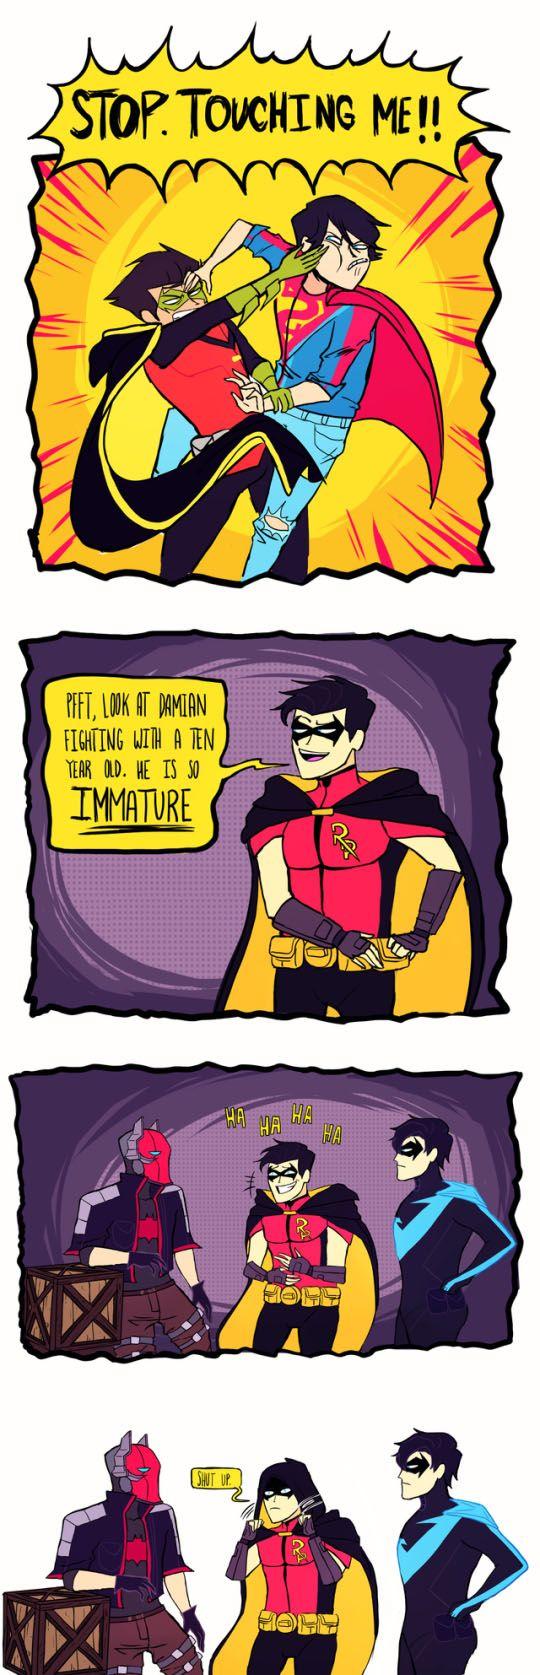 11/02/17  1:57a   DC  Wayne Manor    Damian  aka Robin  and Superboy?  Tim Drake   aka Red Robin   ''Shutup''  and Jason Todd  aka Red Hood   Dick Grayson aka Nightwing